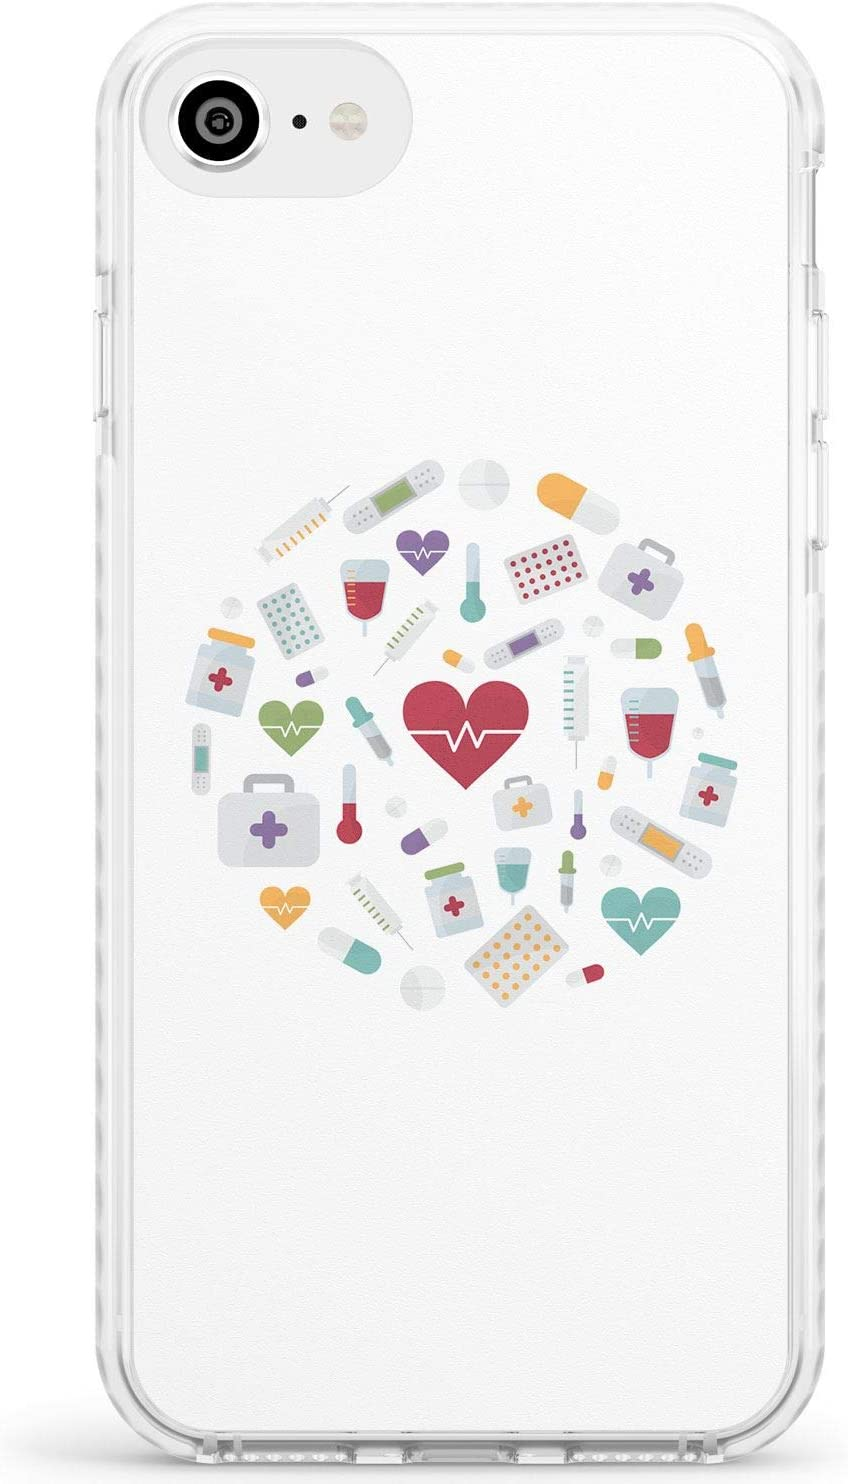 Médico Diseño Inspirado Iconos Médicos Caja del teléfono de impacto para iPhone 6, for iPhone 6s | Protector Doble capa Parachoque TPU silikon Cubrir Modelo Impreso | Enfermera Enfermería Médico Médic